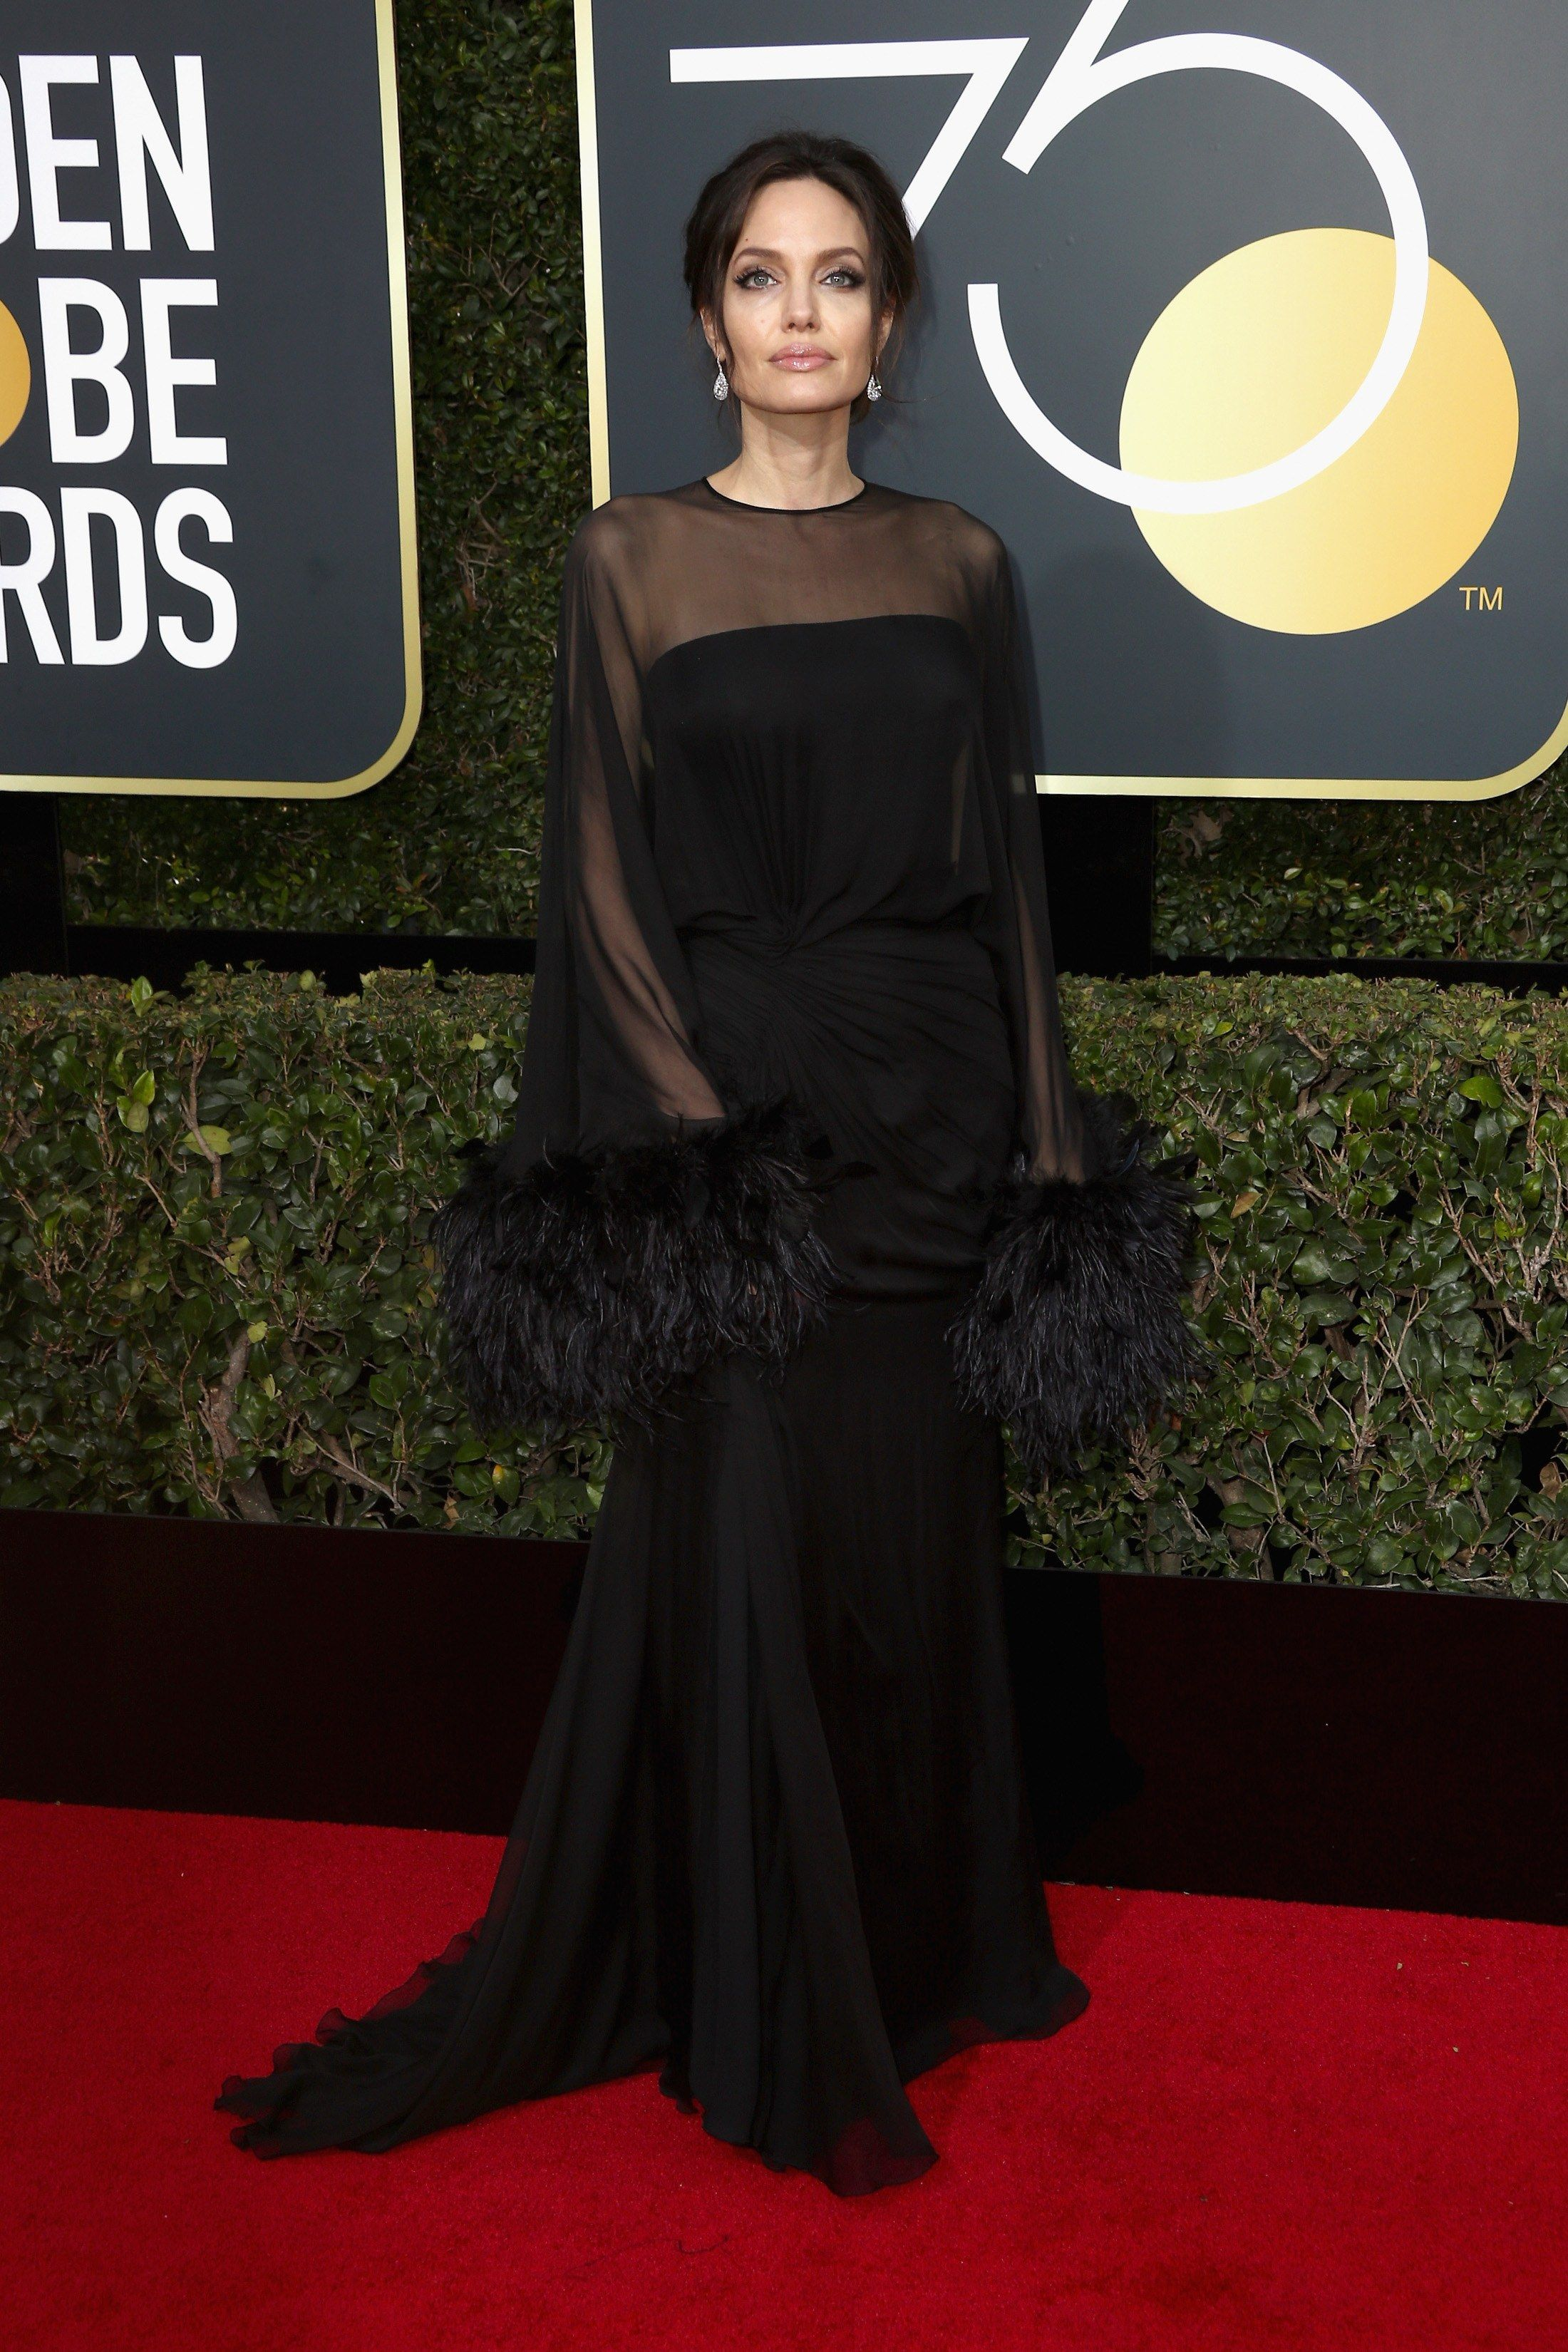 Golden Globes 2018 See Hollywood S Biggest Names Wearing Black Dresses On The Red Carpet Golden Globes Dresses Nice Dresses Golden Globes Fashion